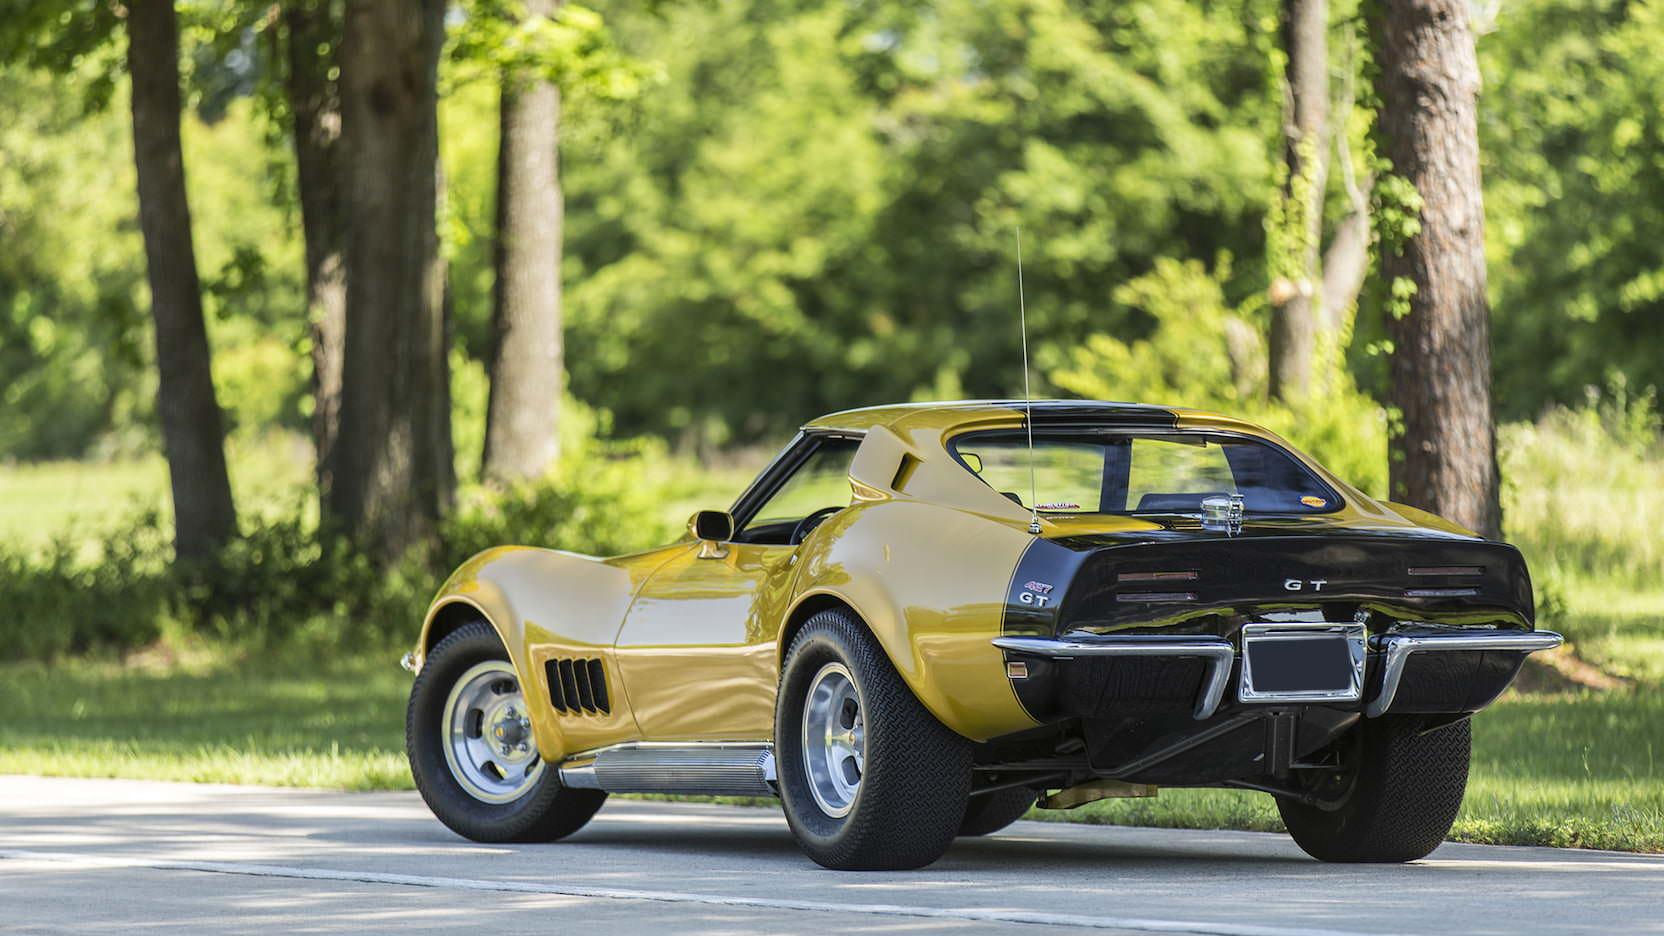 1969 Baldwin Motion Phase III GT Corvette